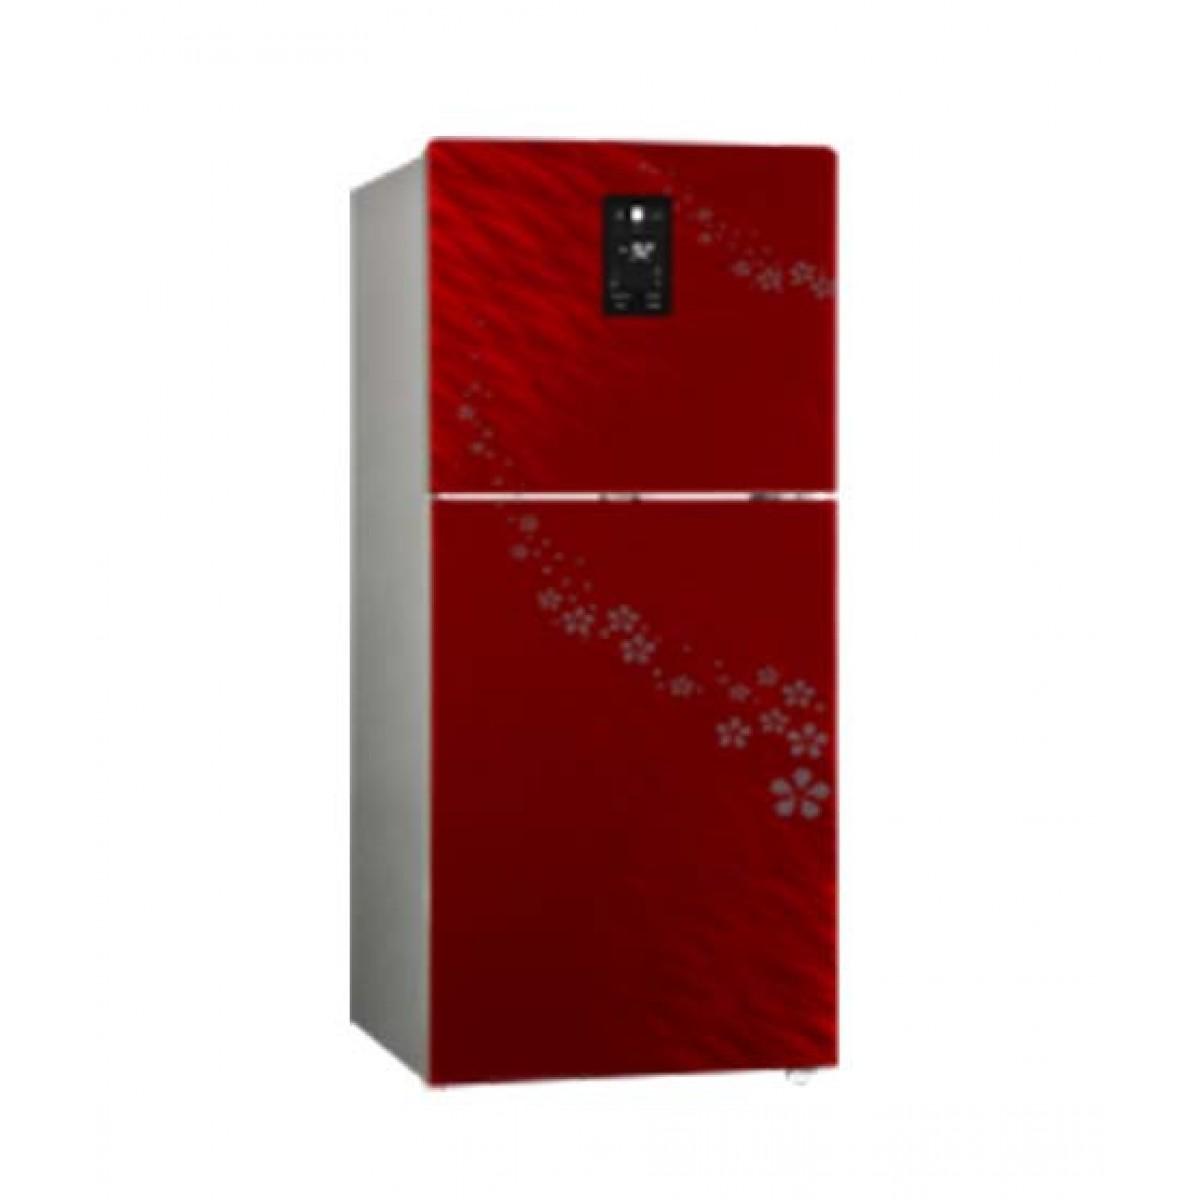 Changhong Ruba Double Door Direct Cool Smart DC Inverter Refrigerator 11 cu ft Red (CHR-DD308GPR)